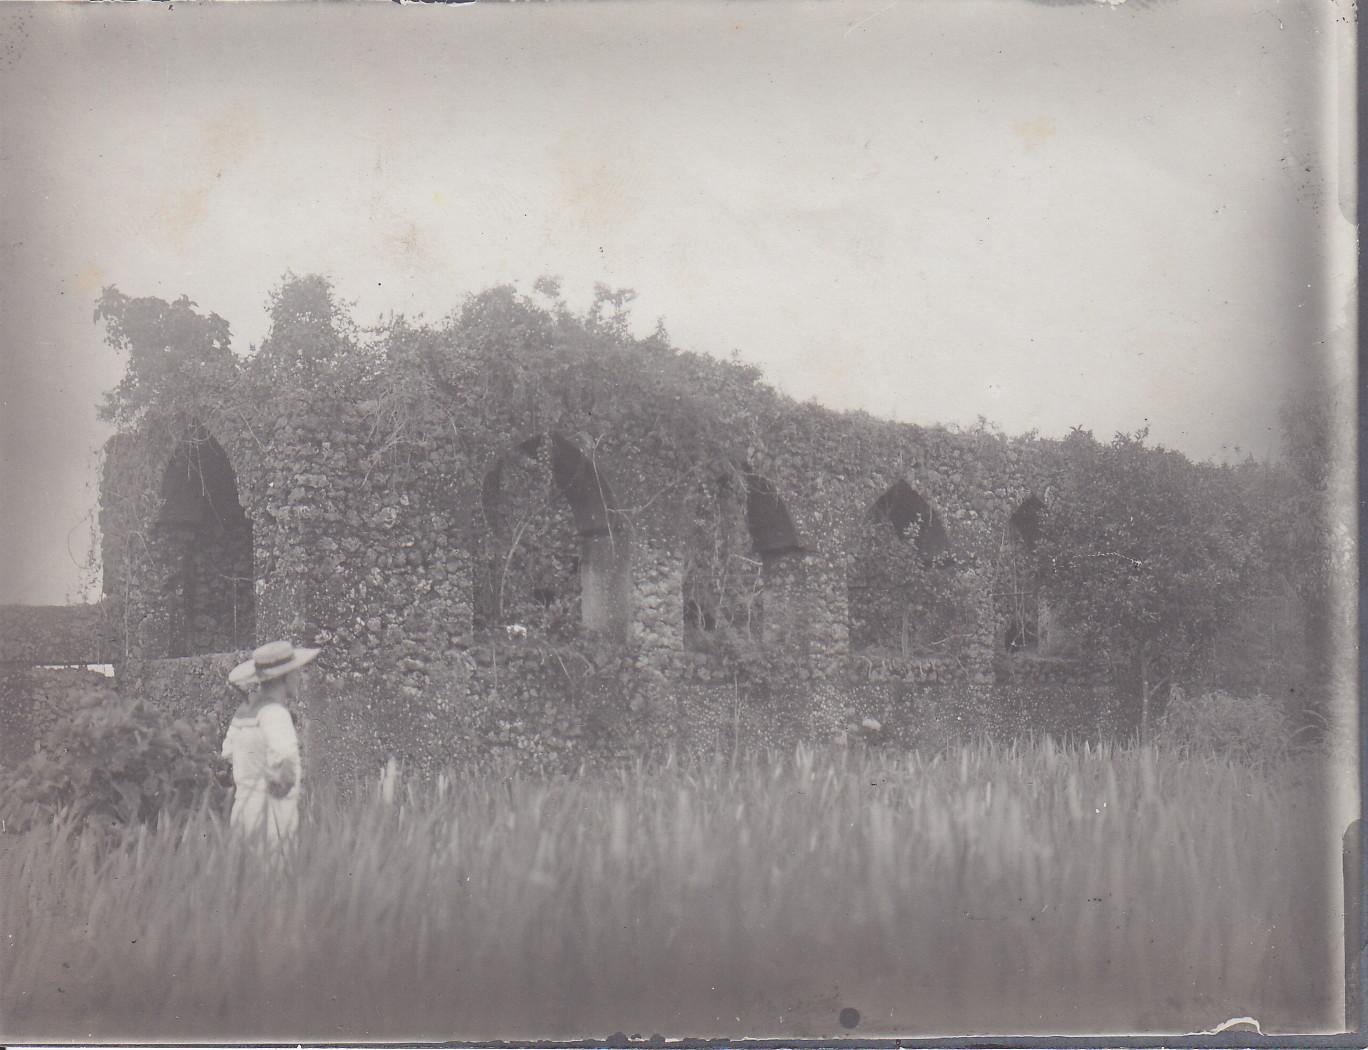 Ruinen in BuBuBu (Vorgelagerte Insel vor Sansibar)